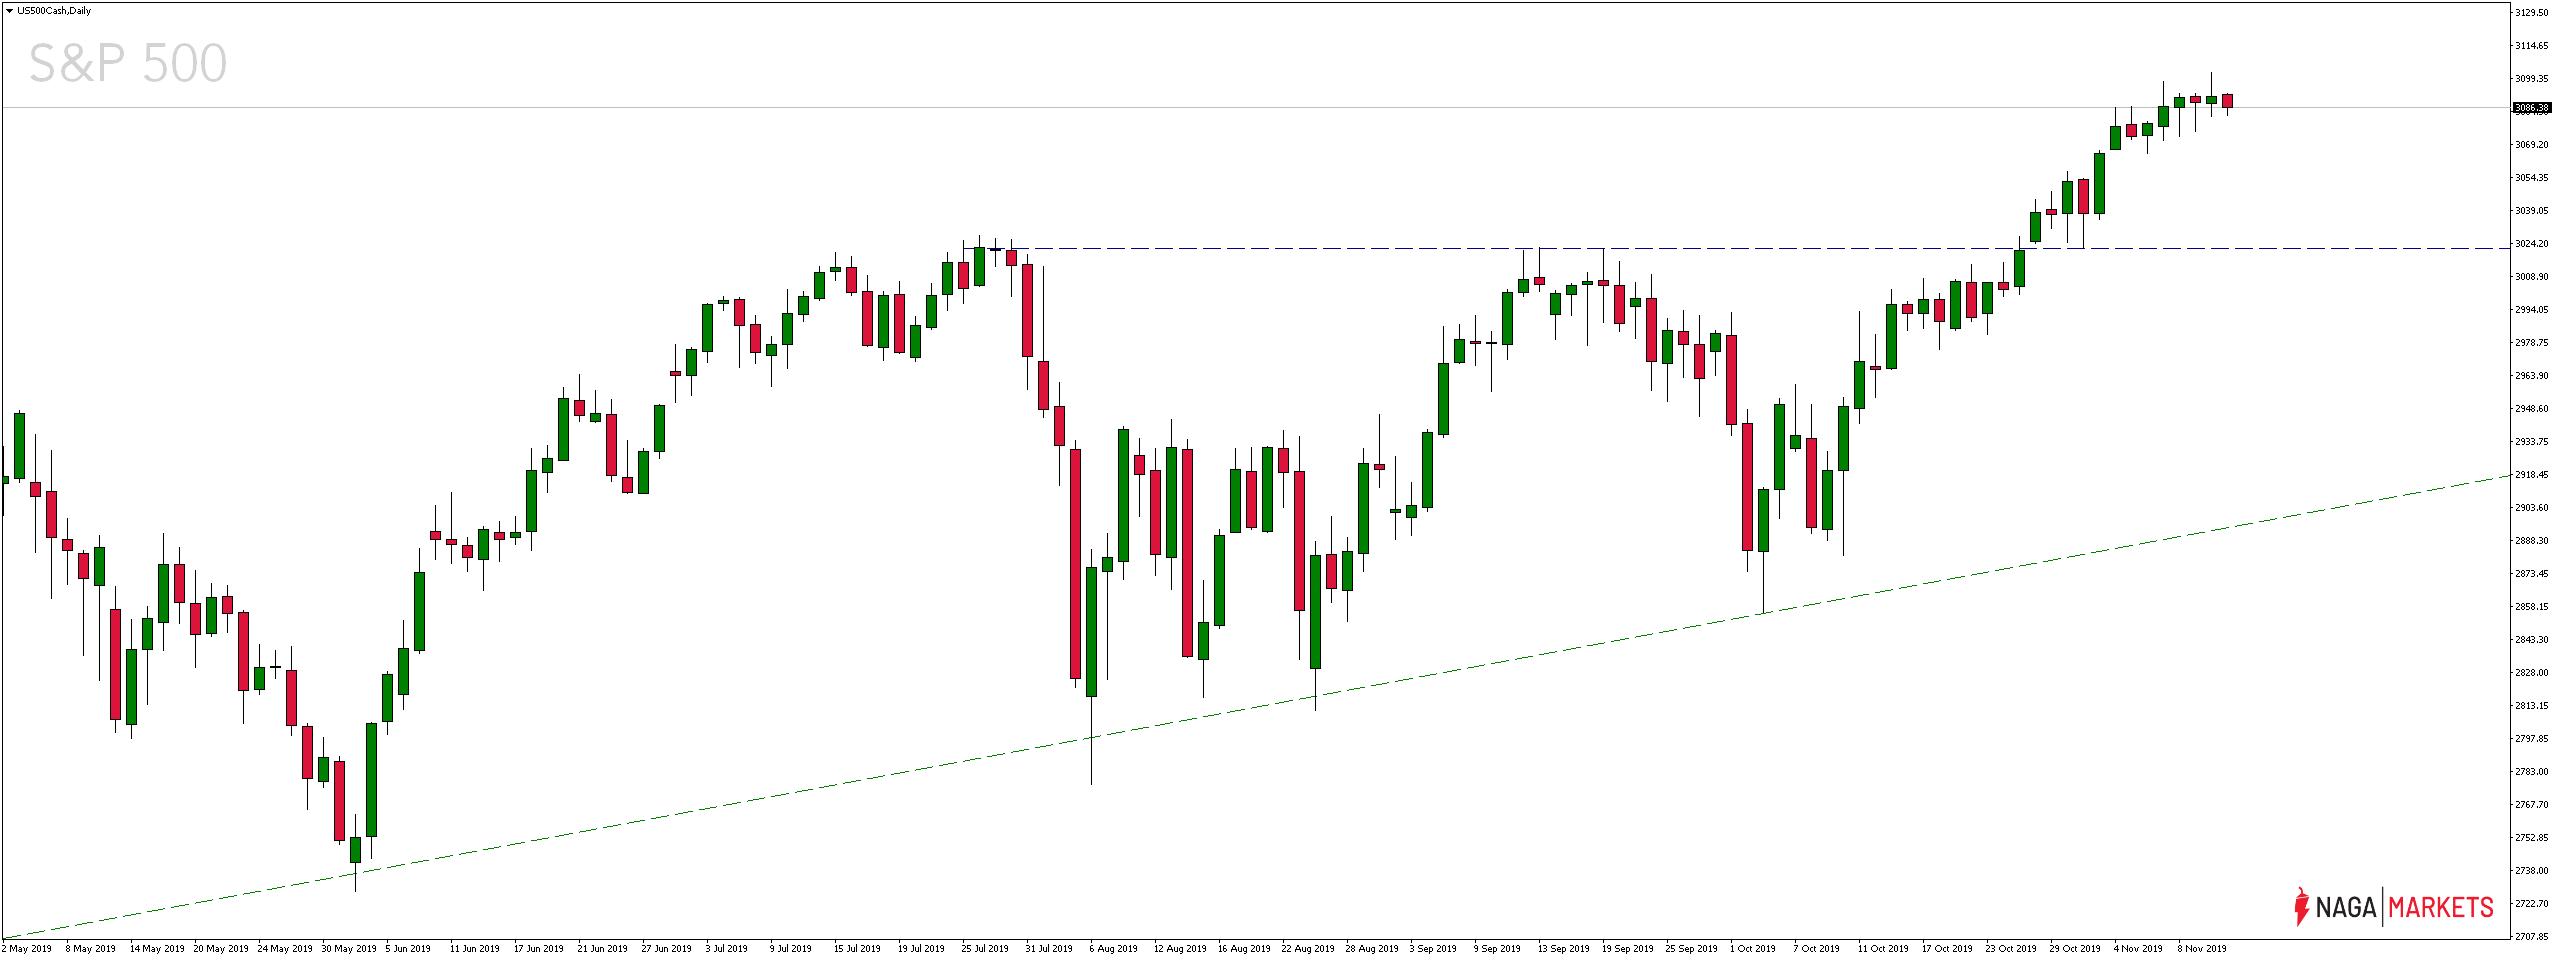 Notowania S&P 500